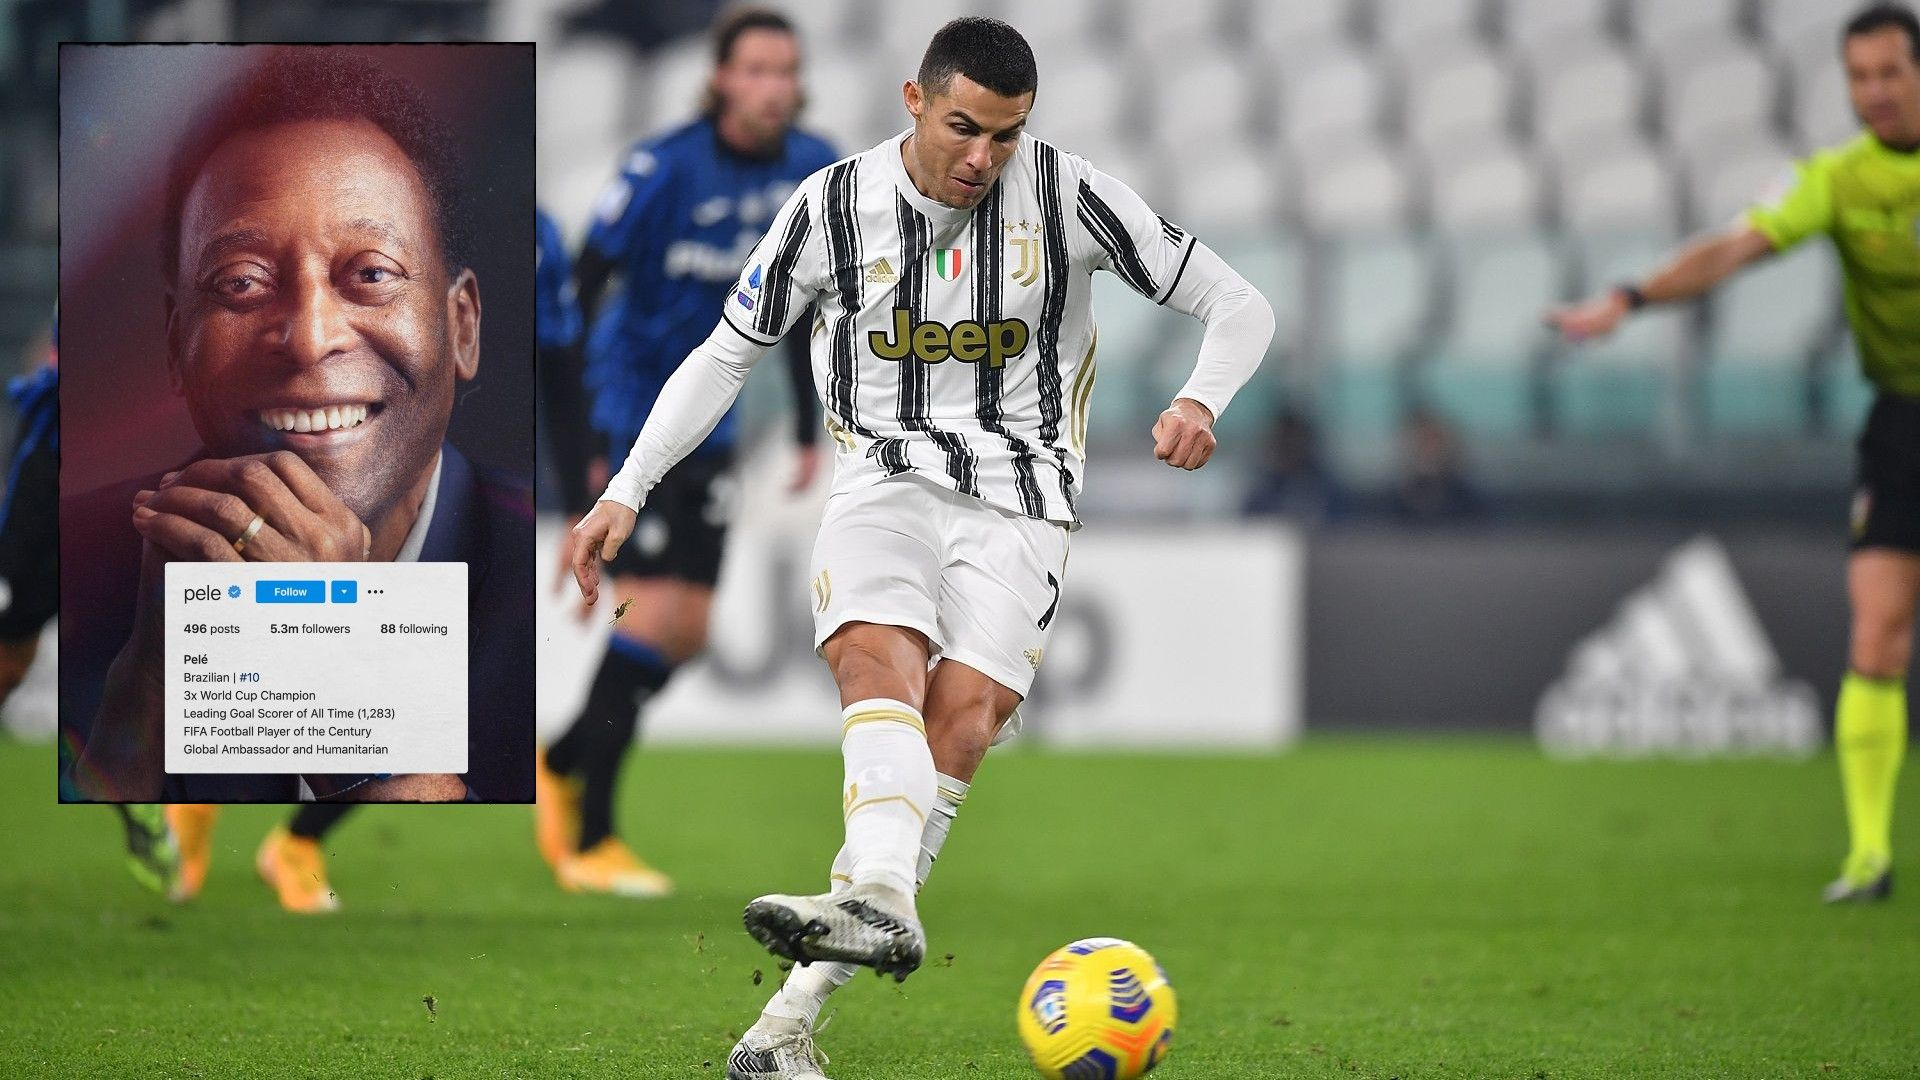 Пеле куриозно промени статистиките си, за да не признае, че Роналдо е бил рекорда му